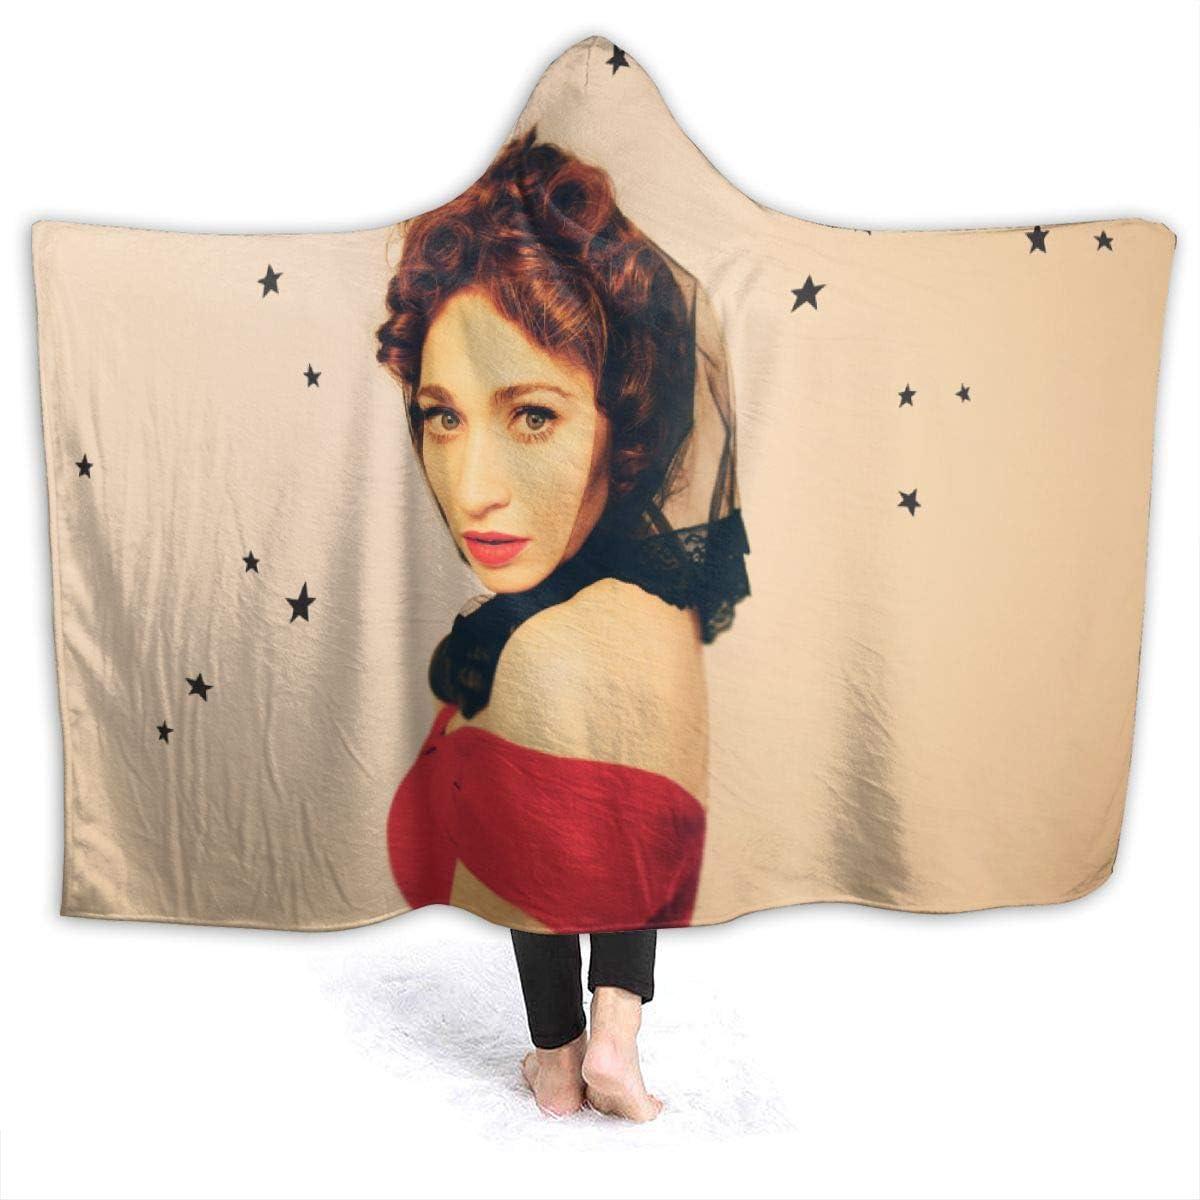 MHOLEBUKL Regina Spektor Hooded Throw Blanket Cobijas Franela Bedding Manta De Felpa Suave Aire Acondicionado De Oficina Mantas De Sofá Cama para Bolsa De Dormer